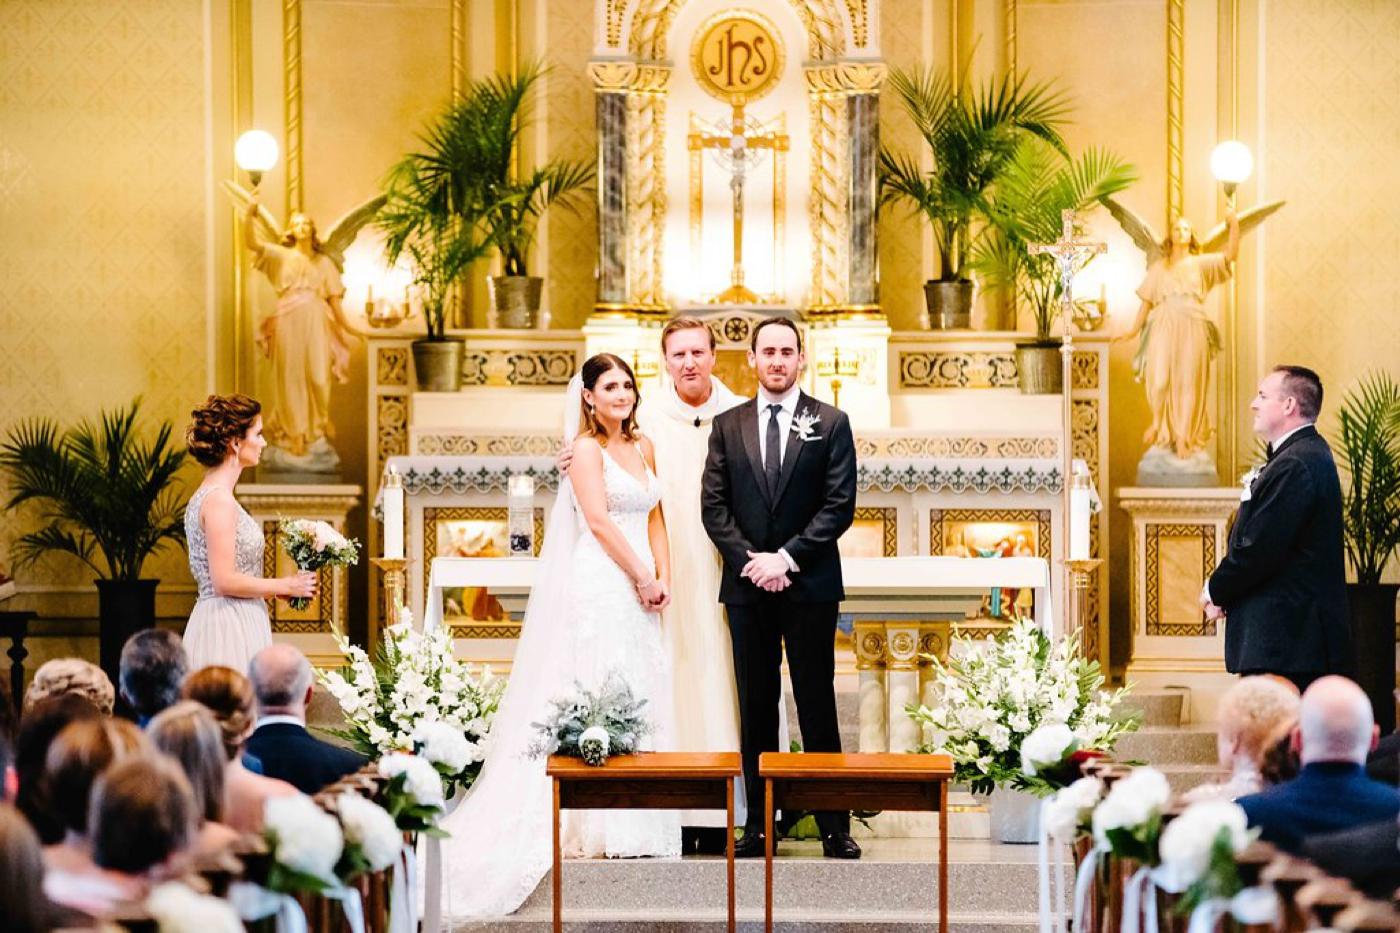 chicago-fine-art-wedding-photography-duncan40